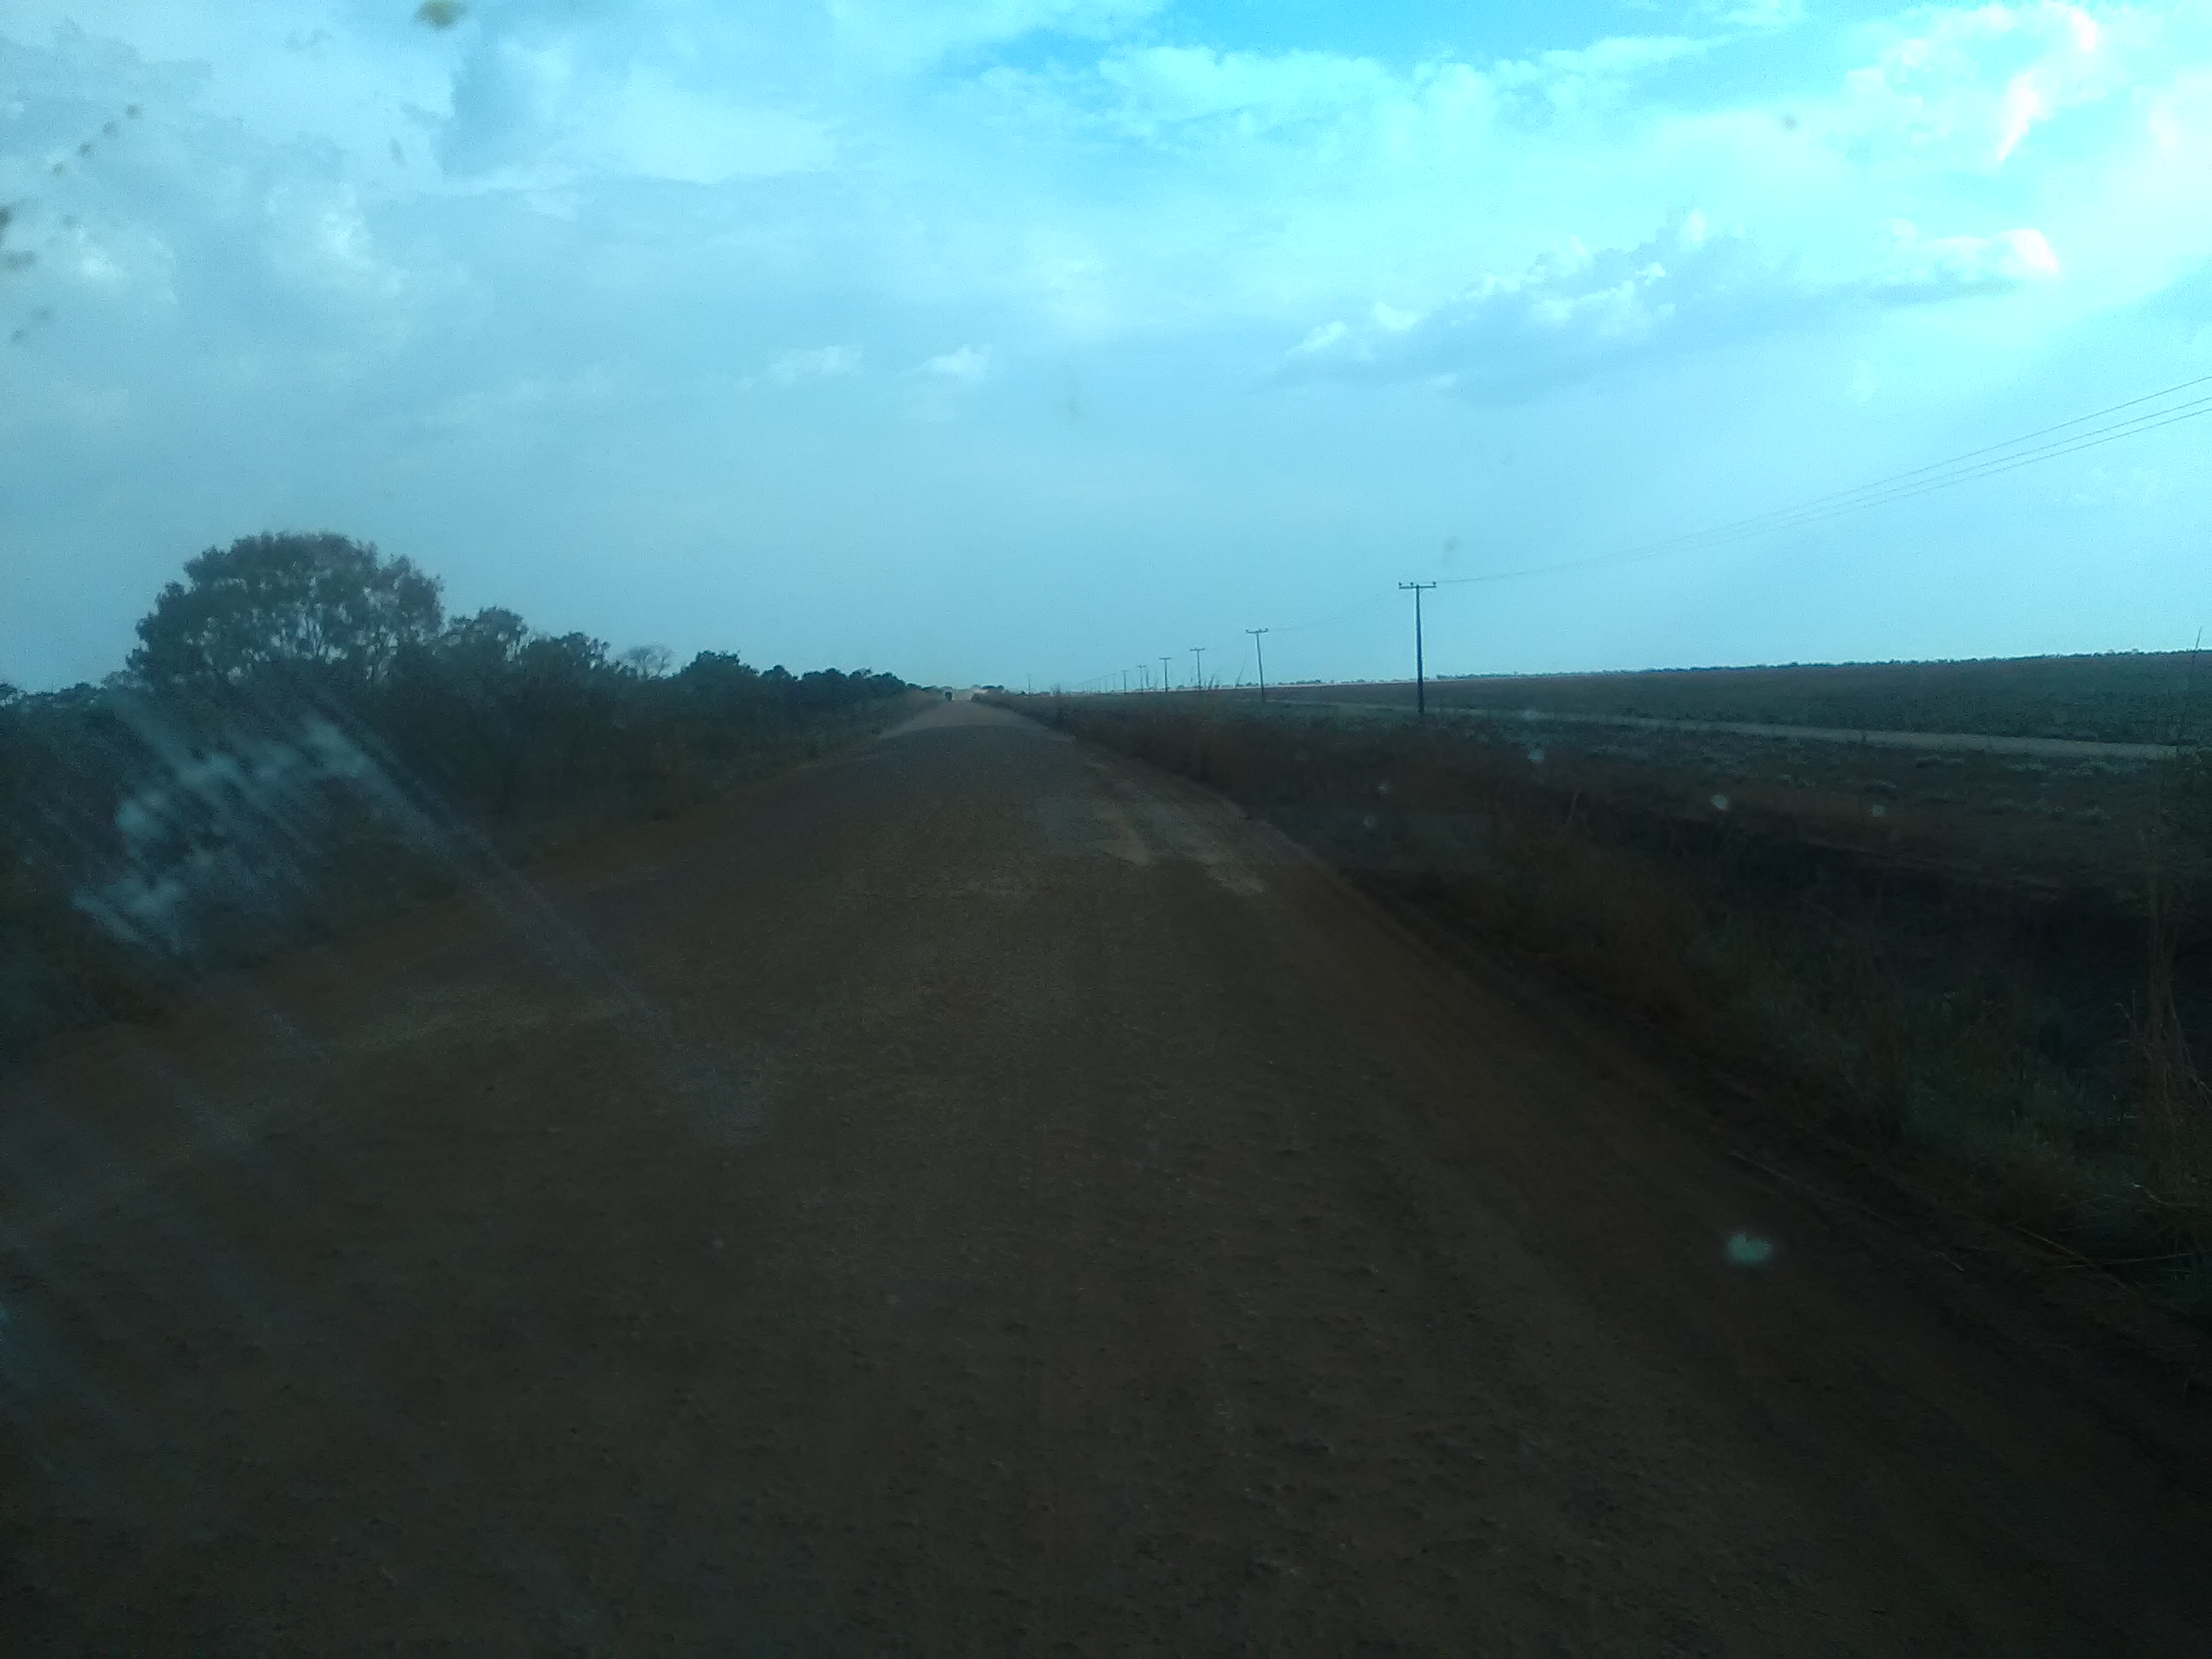 Dit-is-de-weg.-soms-tot-minder-dan-5-Km-per-uur--45